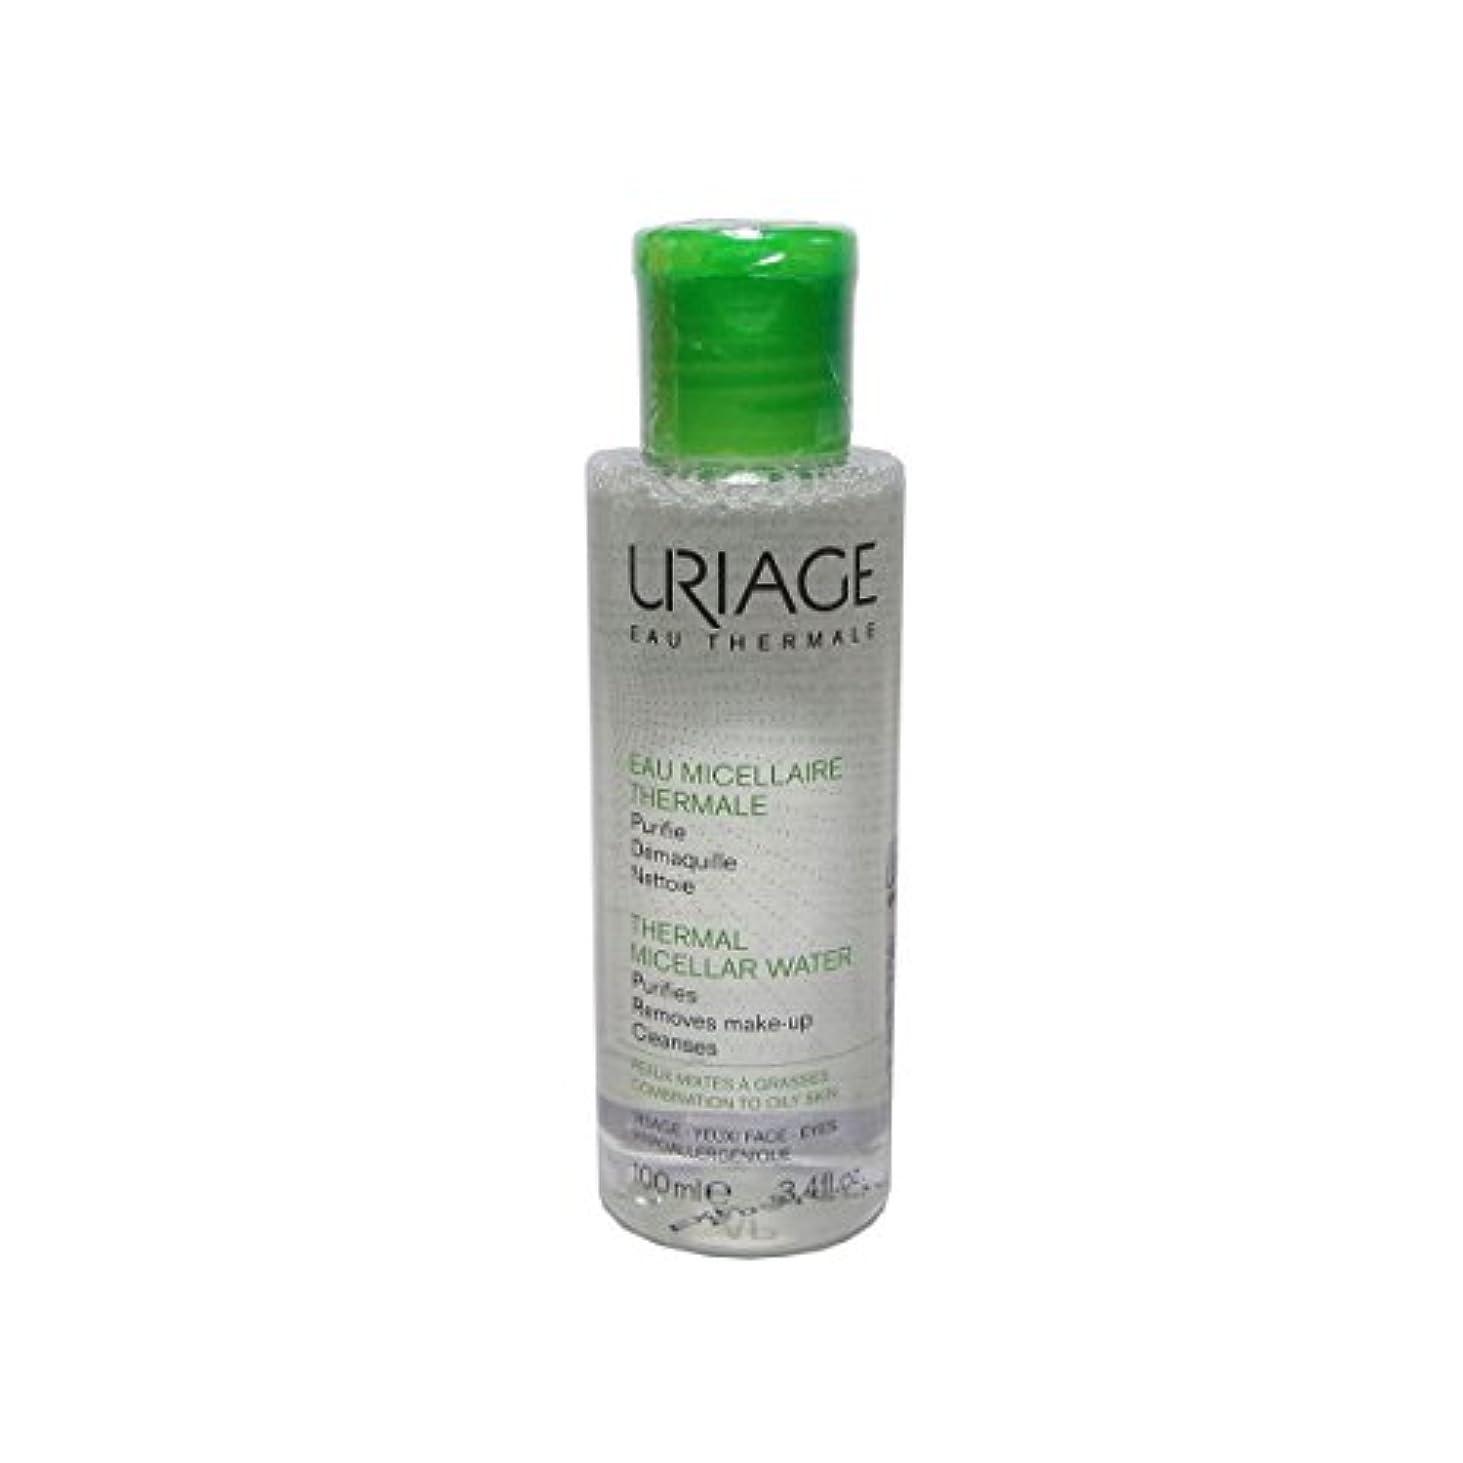 Uriage Thermal Micellar Water Combination To Oily Skin 100ml [並行輸入品]